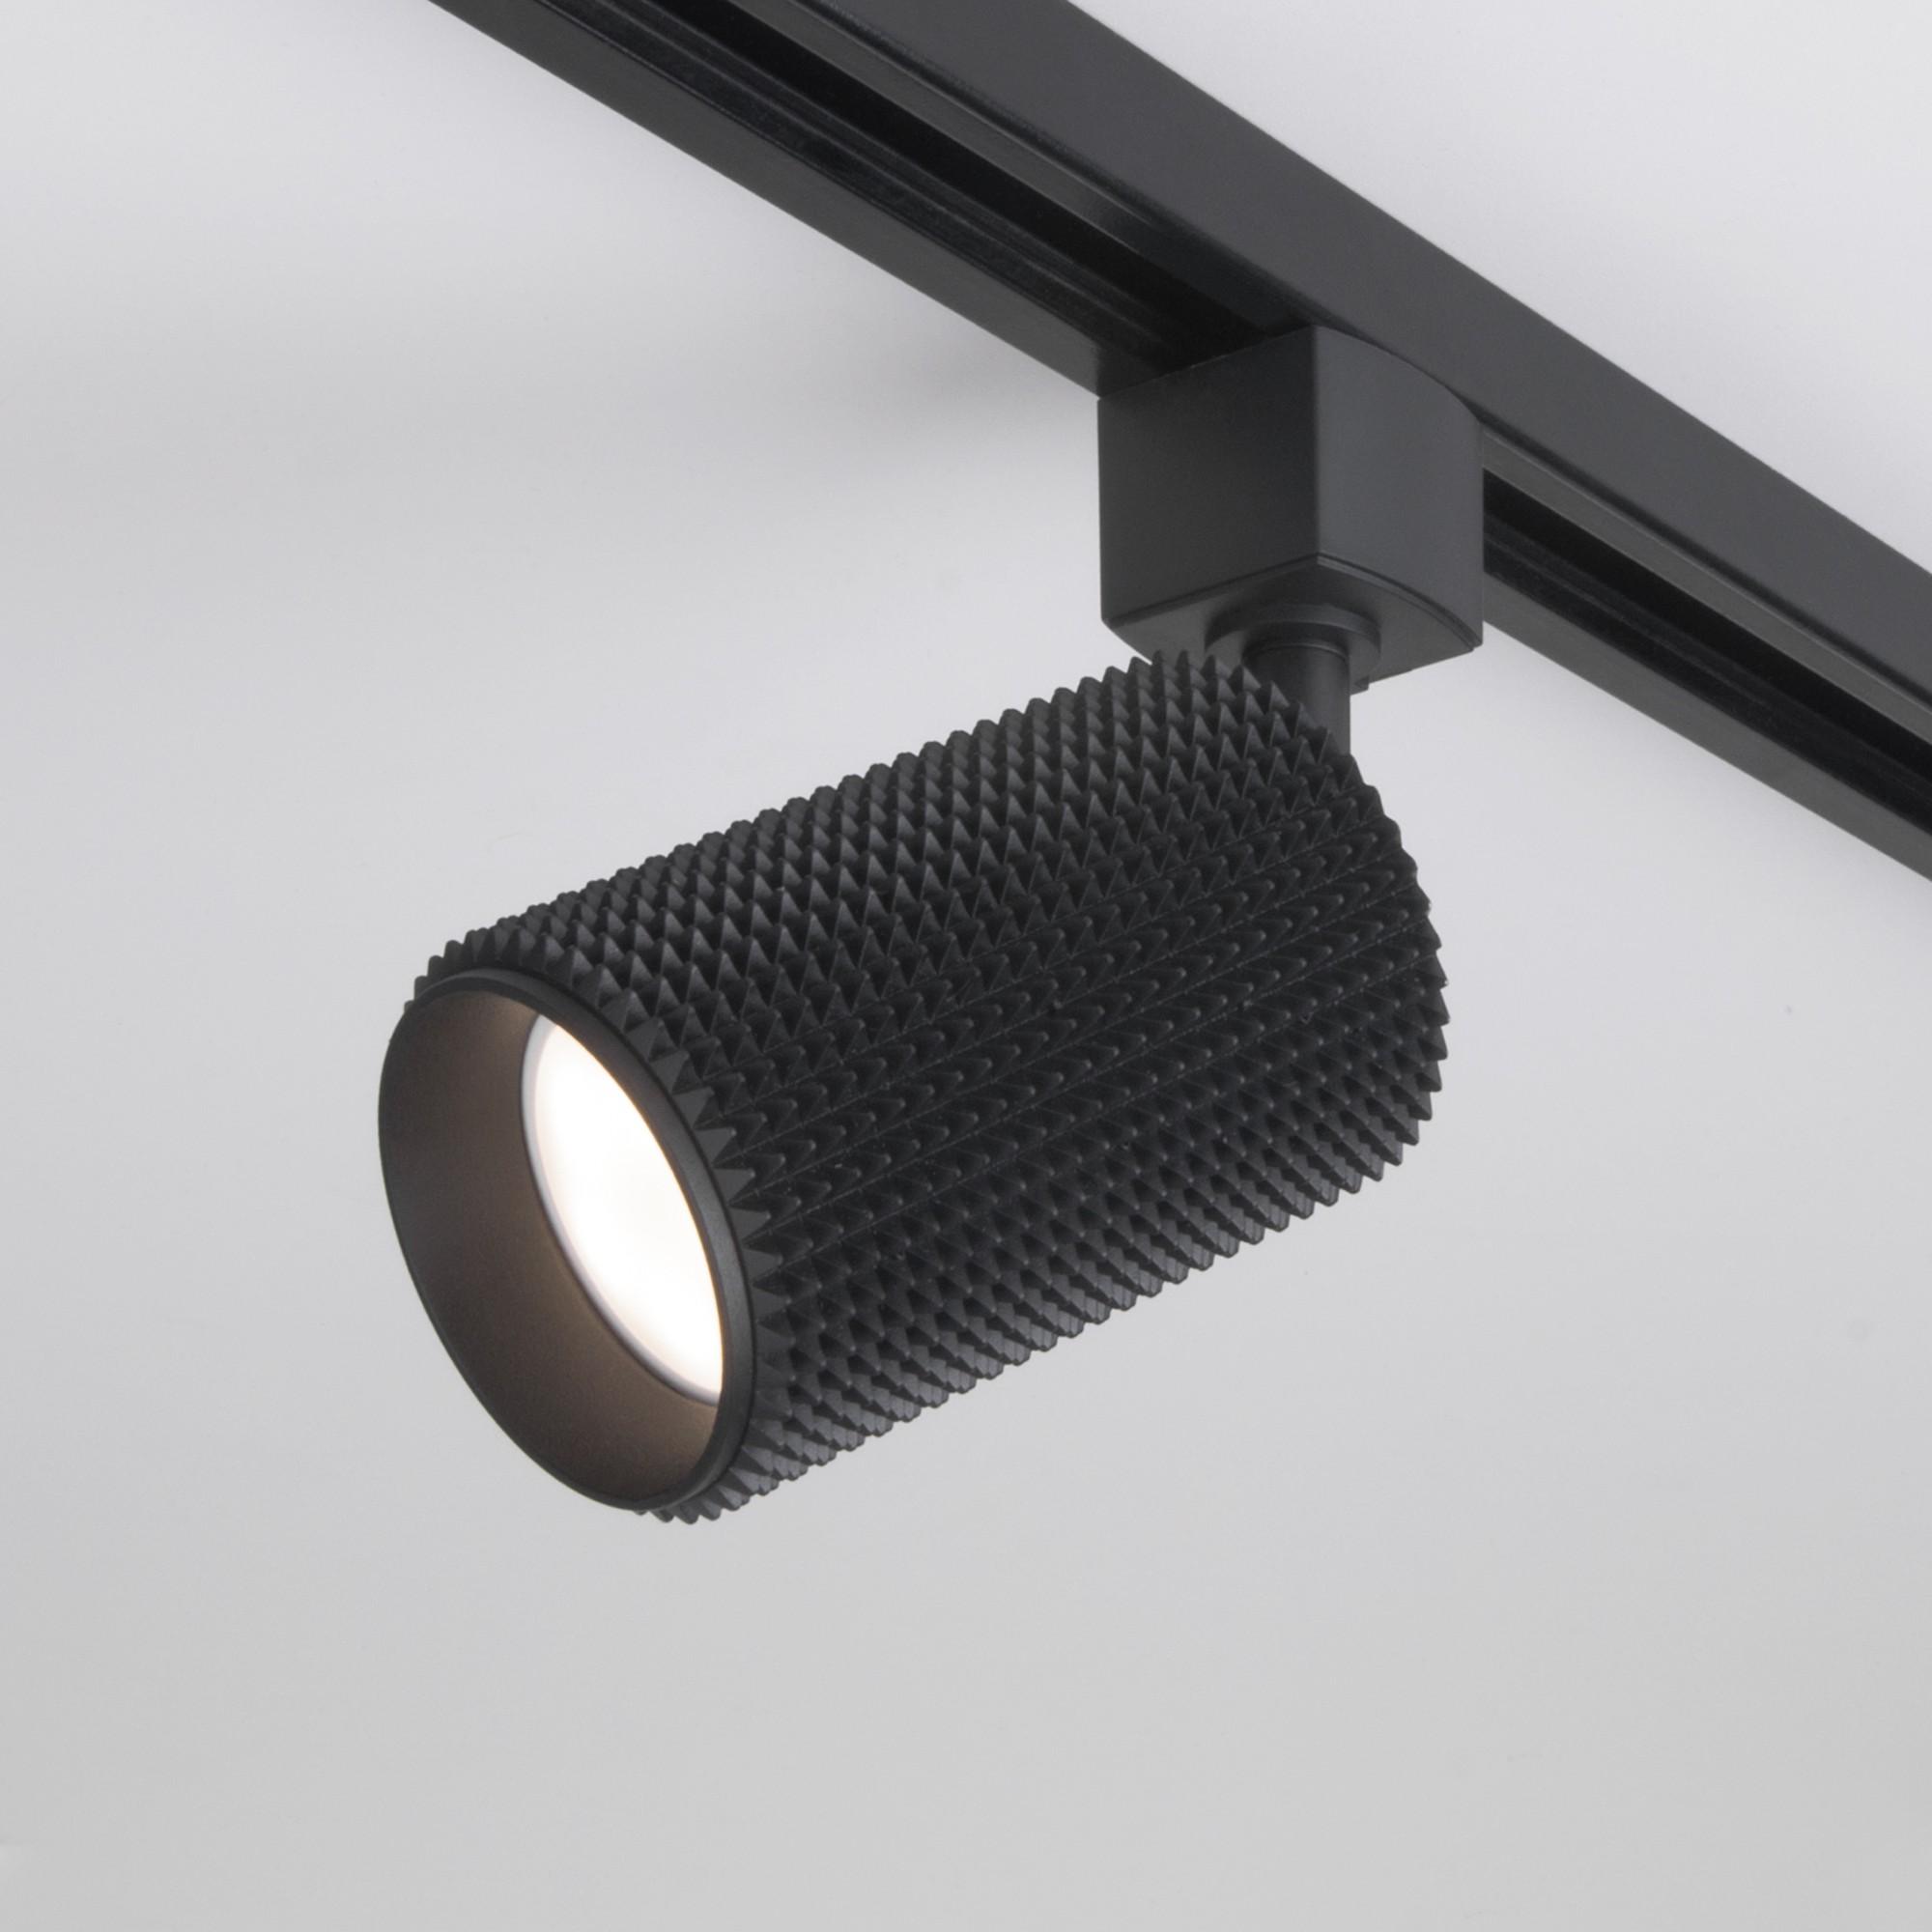 Spike GU10 Черный (MRL 1011) однофазный